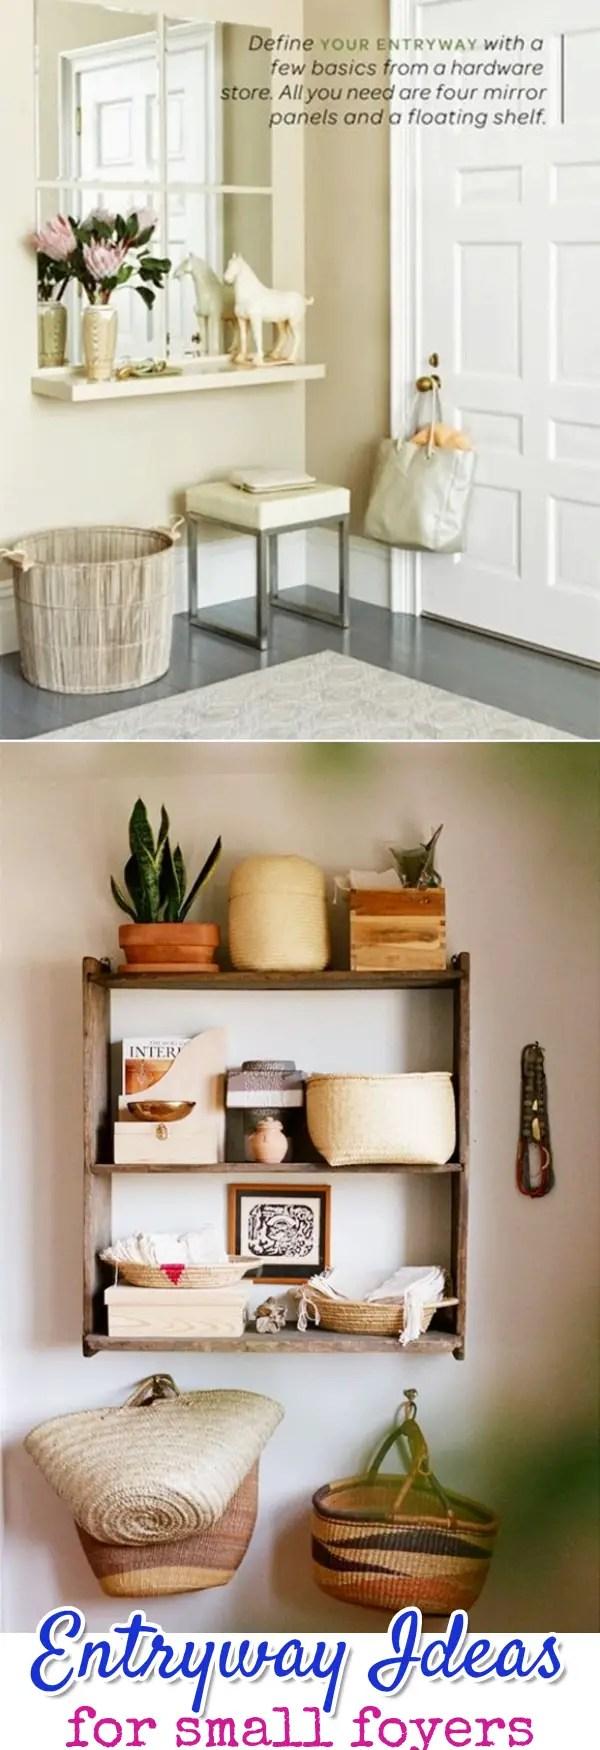 Small Foyer Decorating Ideas   Small Entryway Decor And Small Foyer  Decorating Ideas